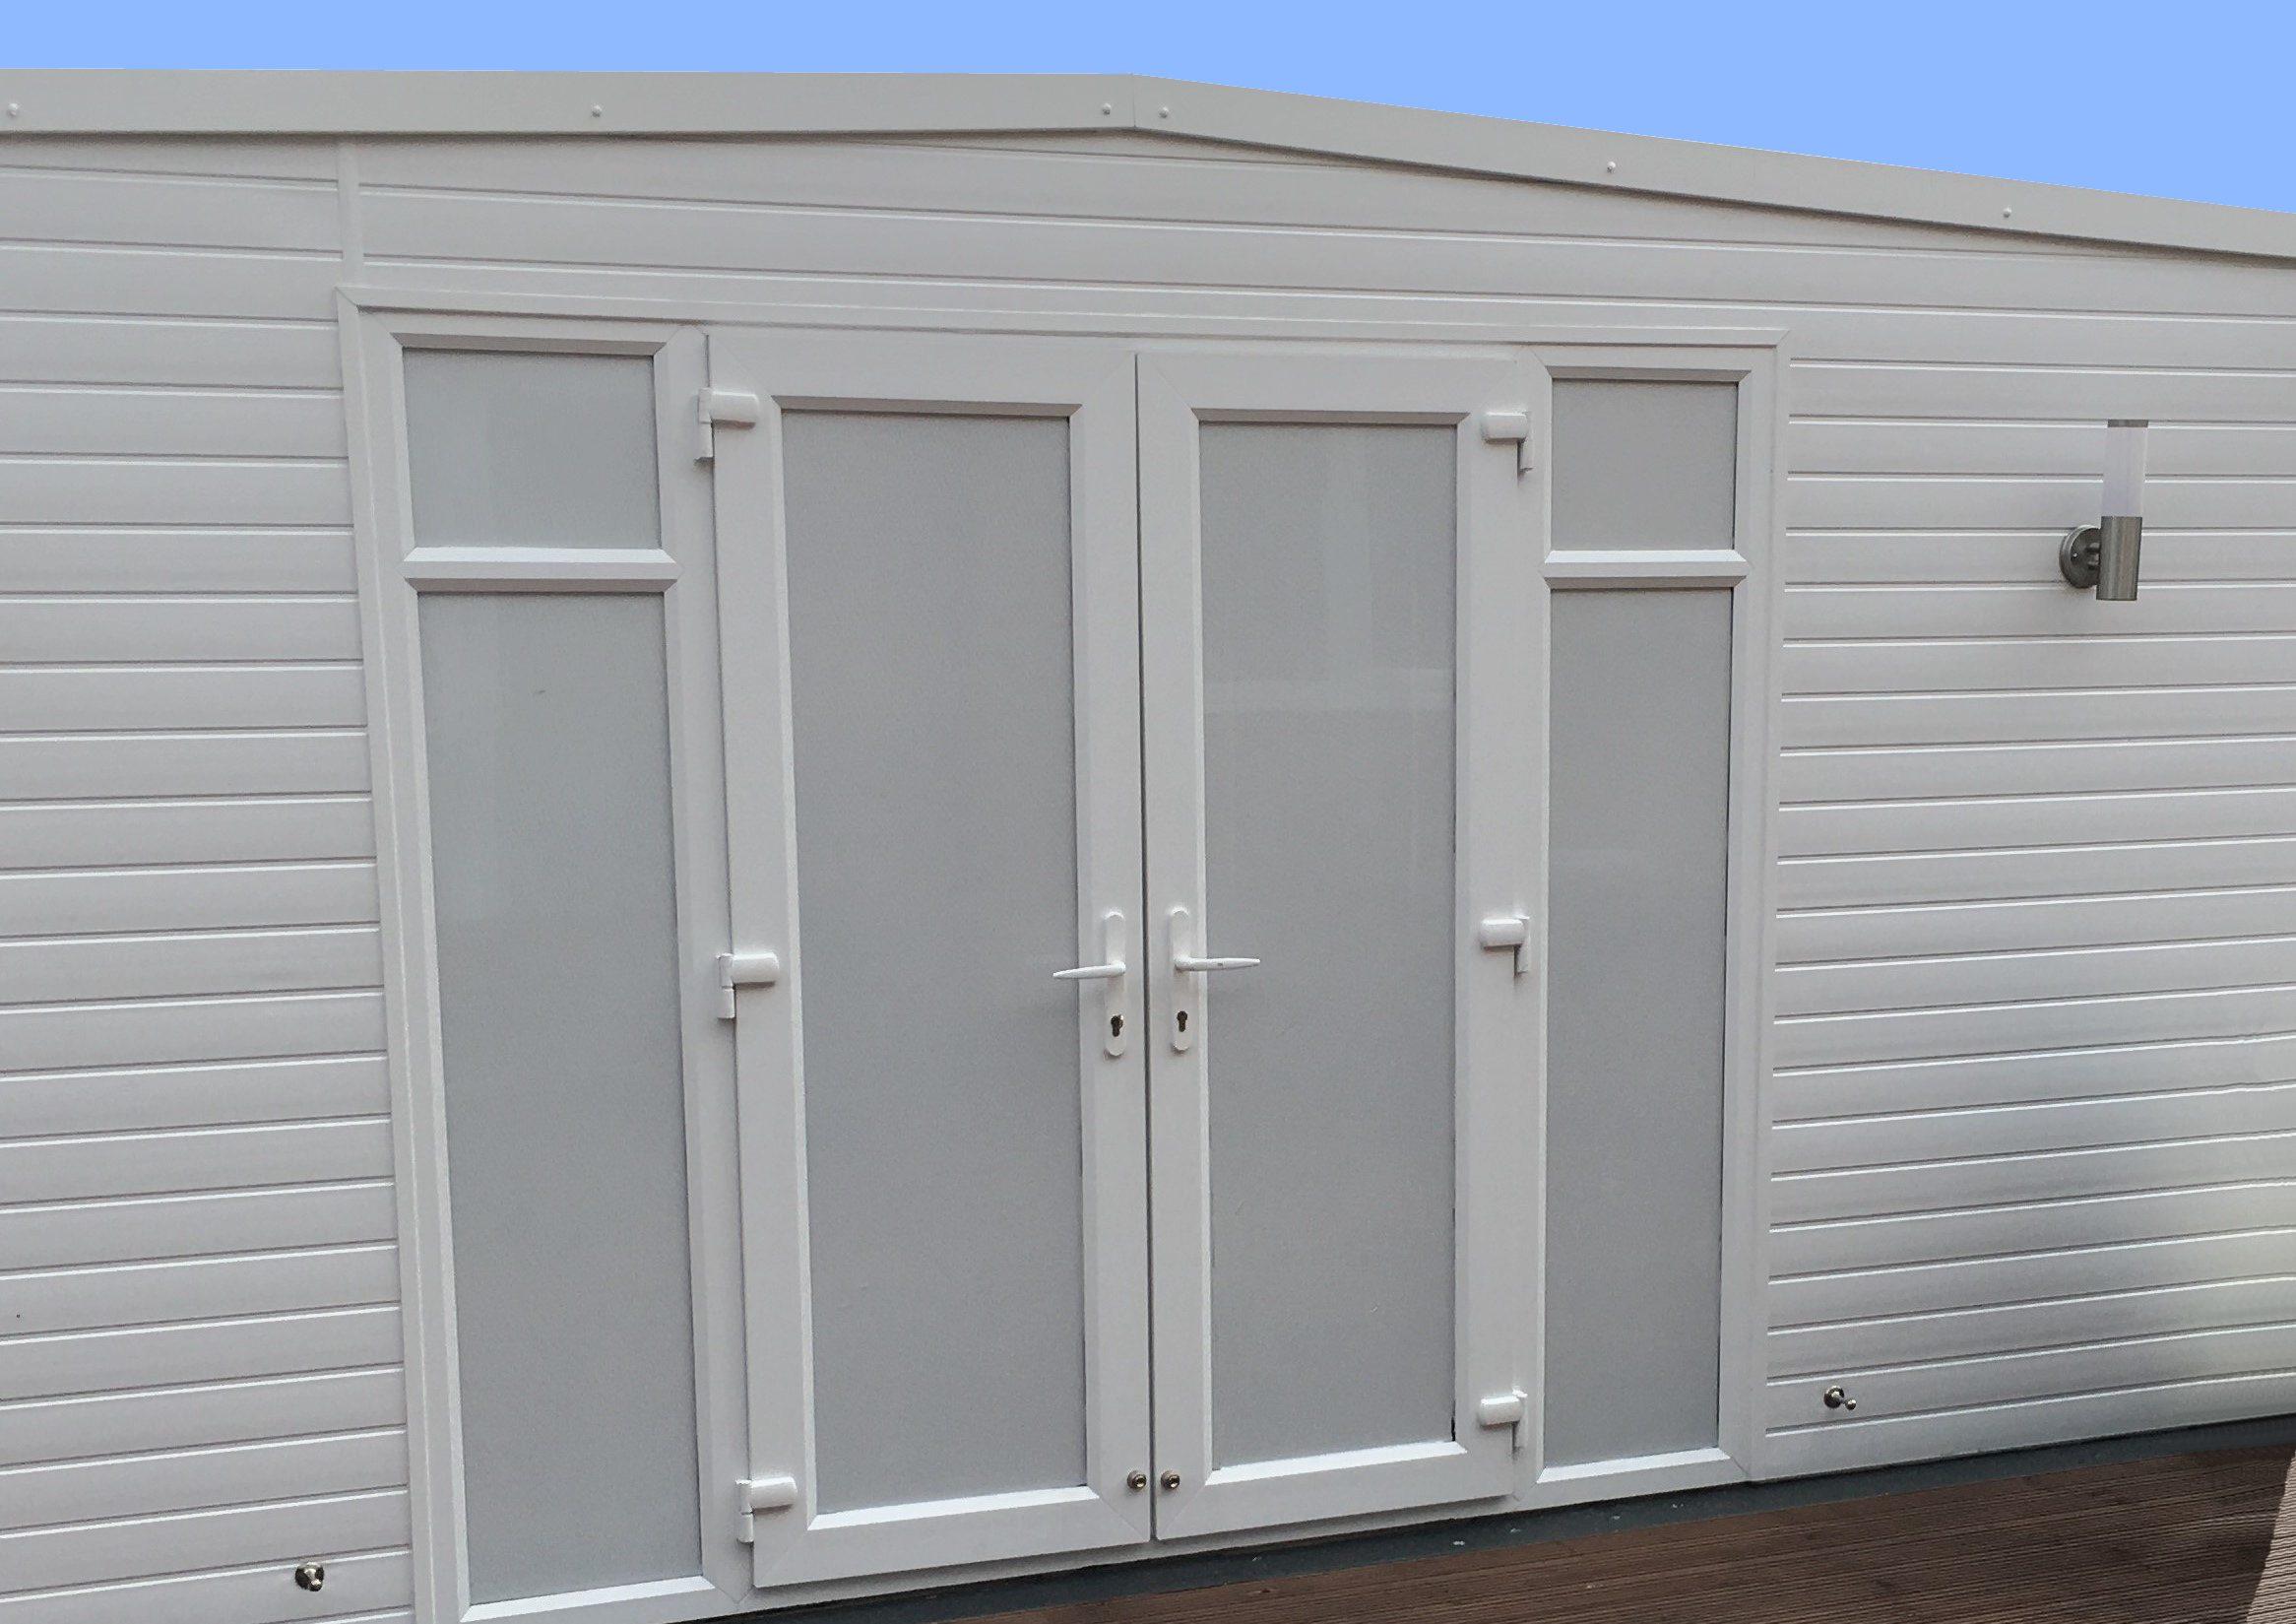 White one way privacy window film